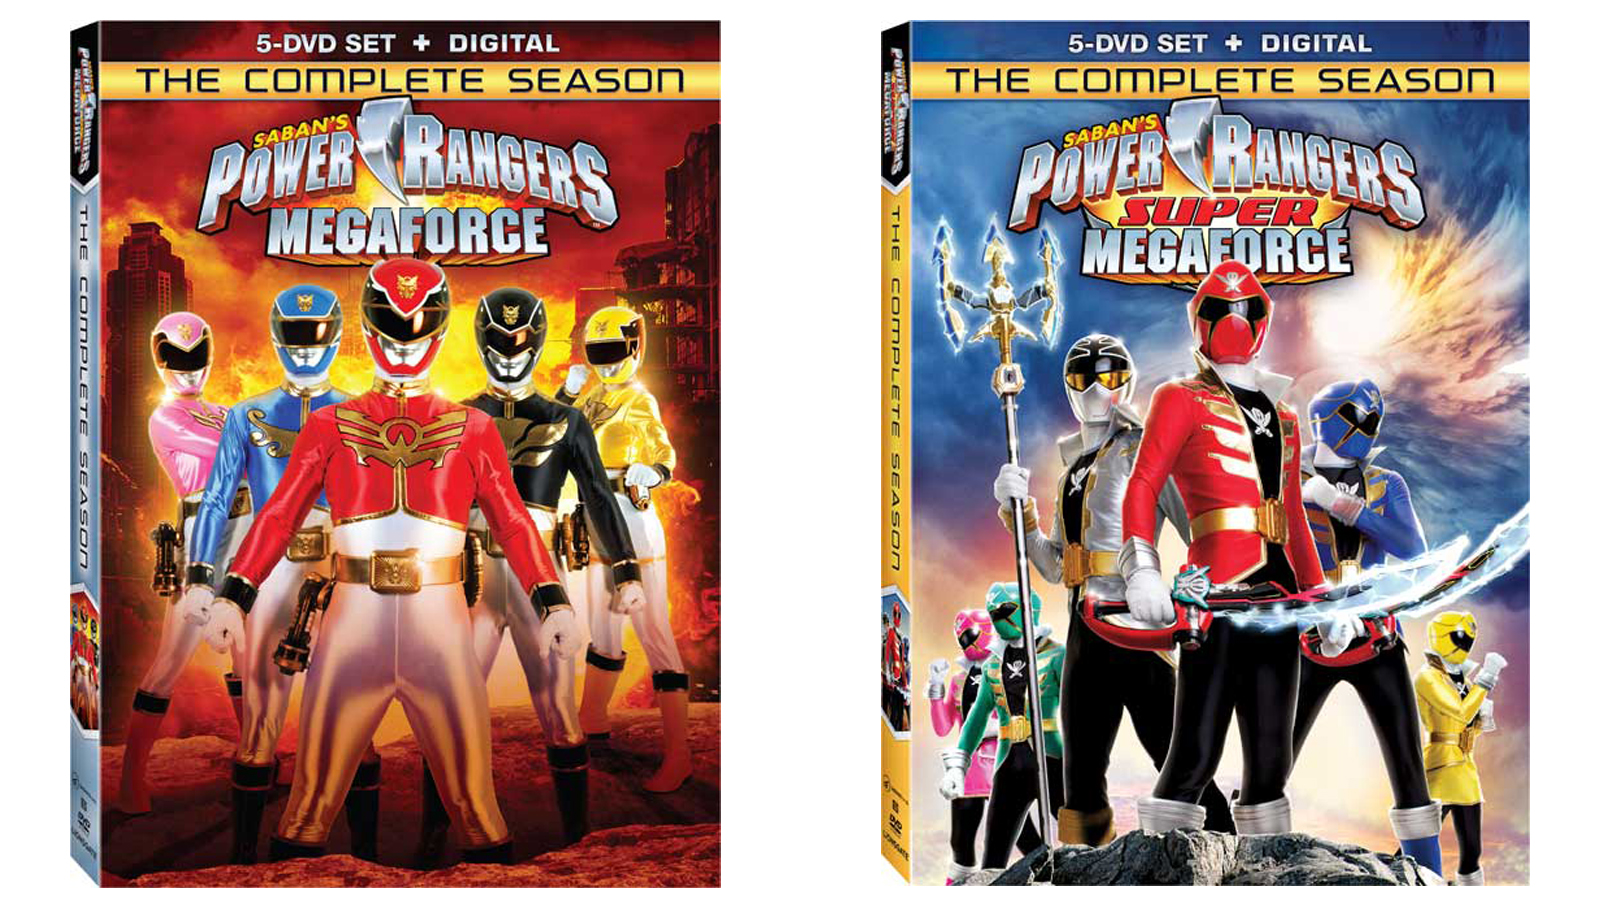 Power Rangers Megaforce & Super Megaforce Complete Season DVDs Announced